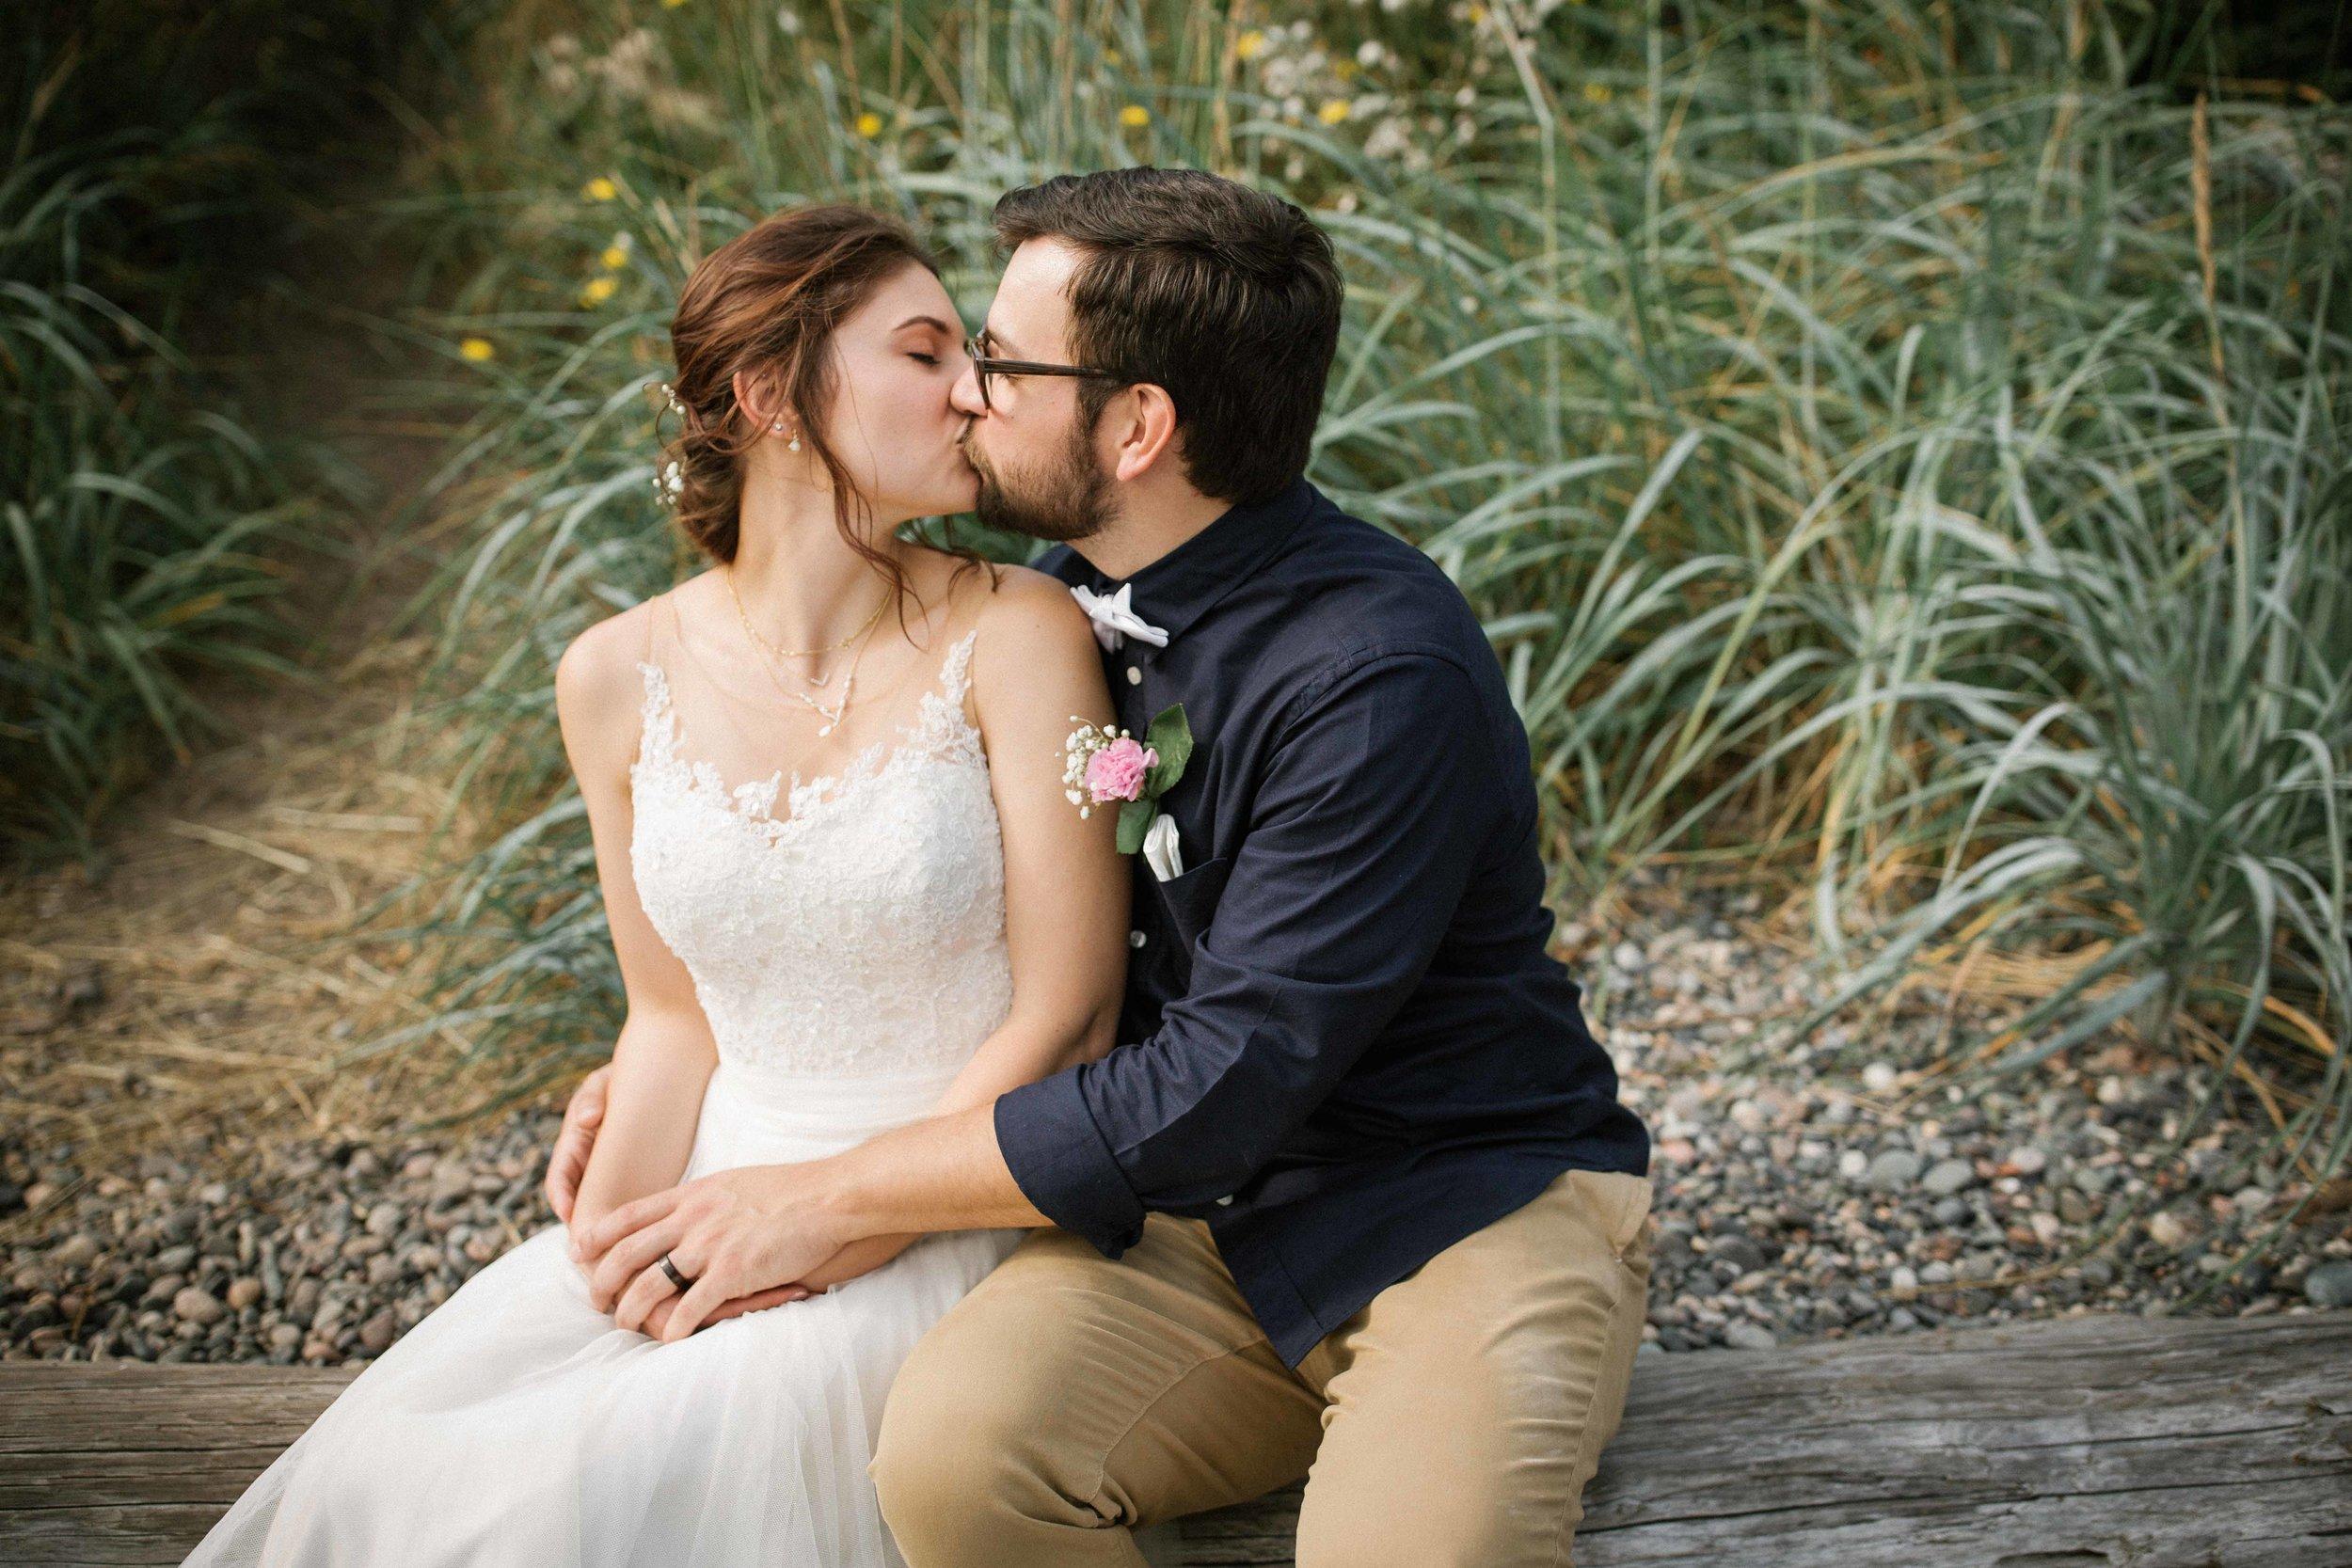 deception-pass-wedding-59.jpg